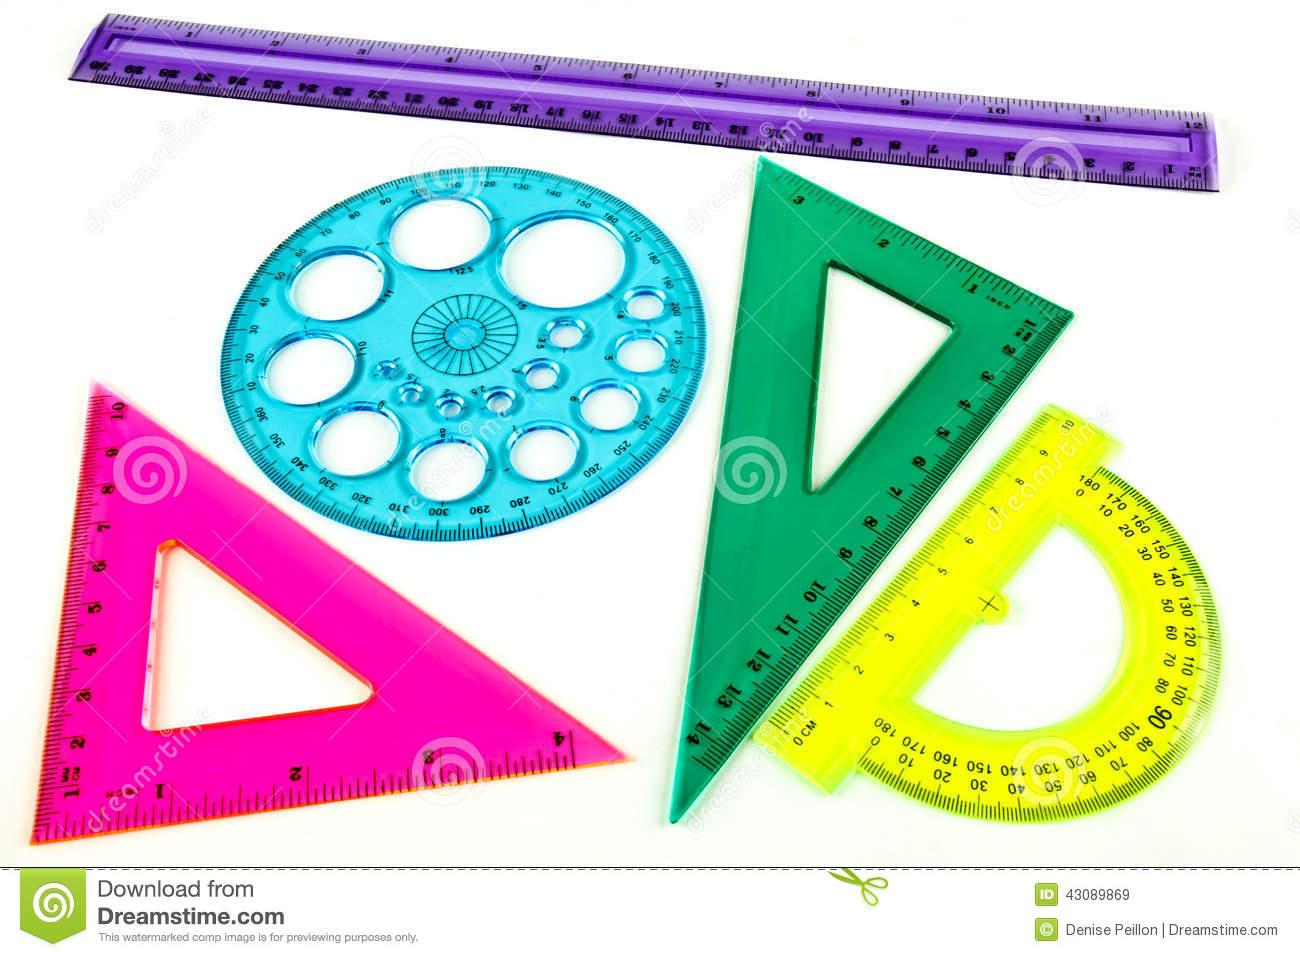 Geometry clipart geometry tool. Tools portal